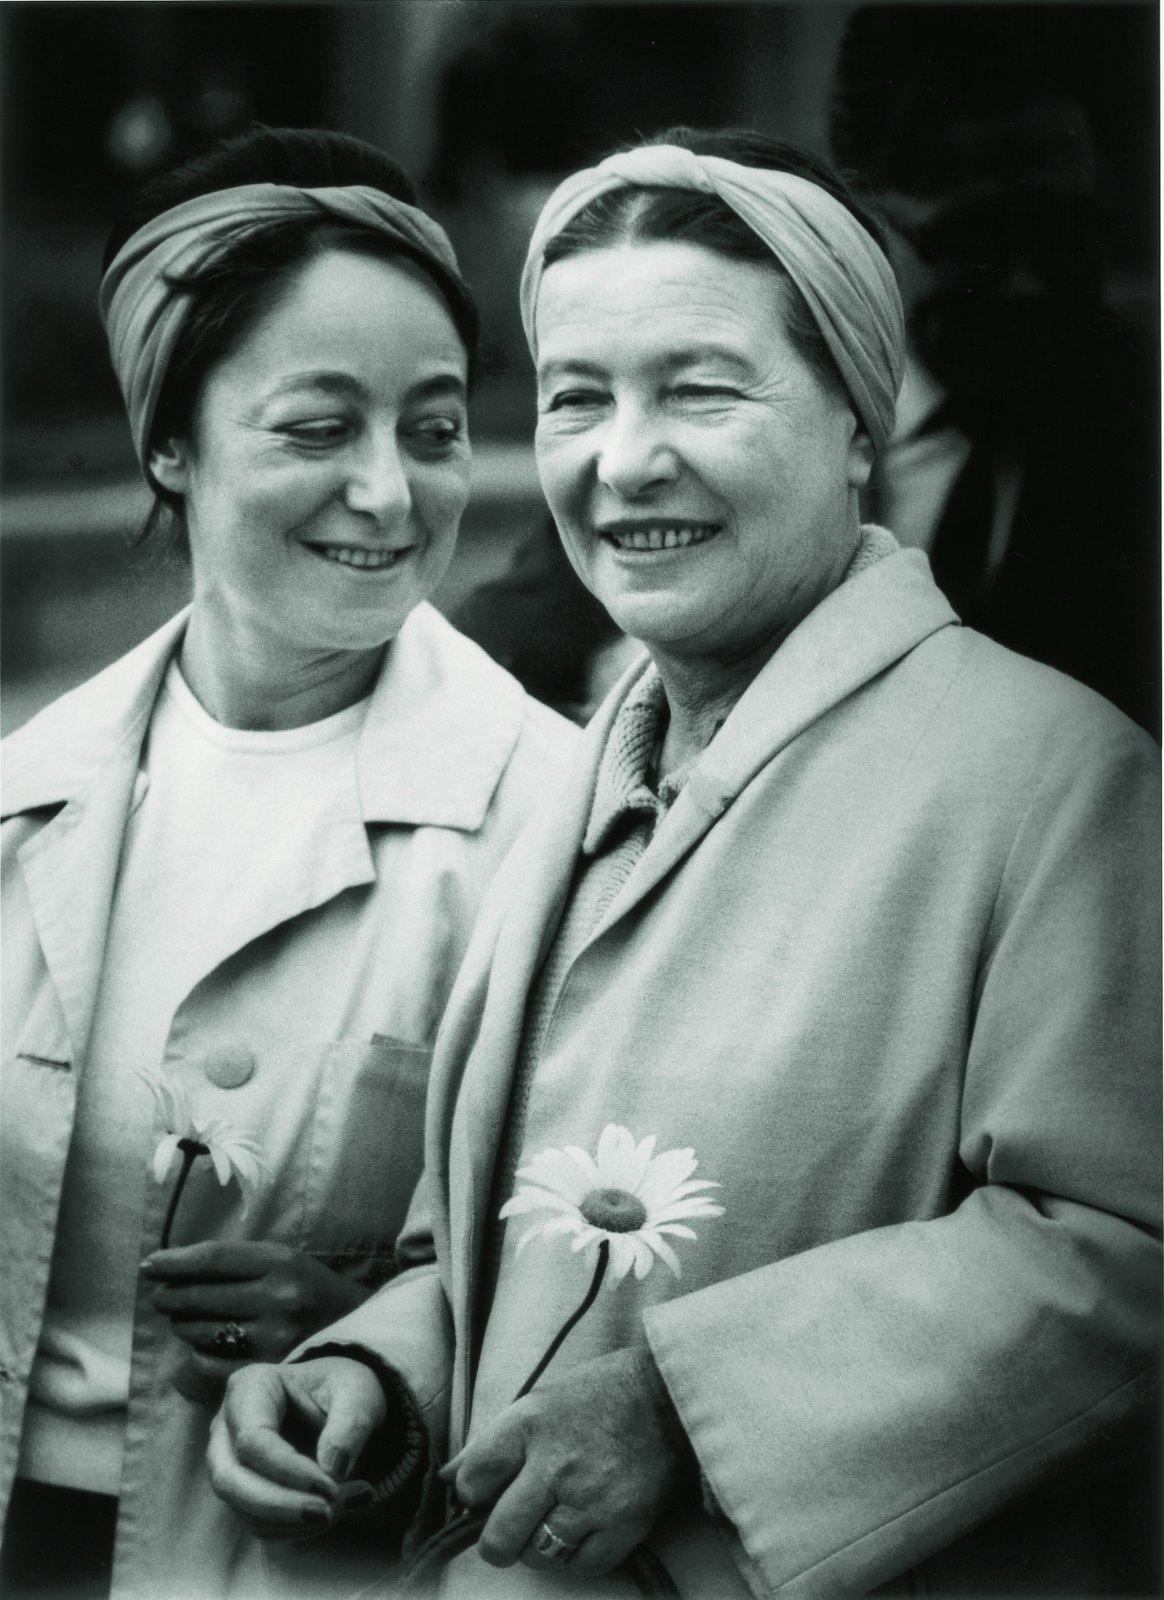 35. 1965. С. де Бовуар и Л. Жомина в аэропорту Вильнюса